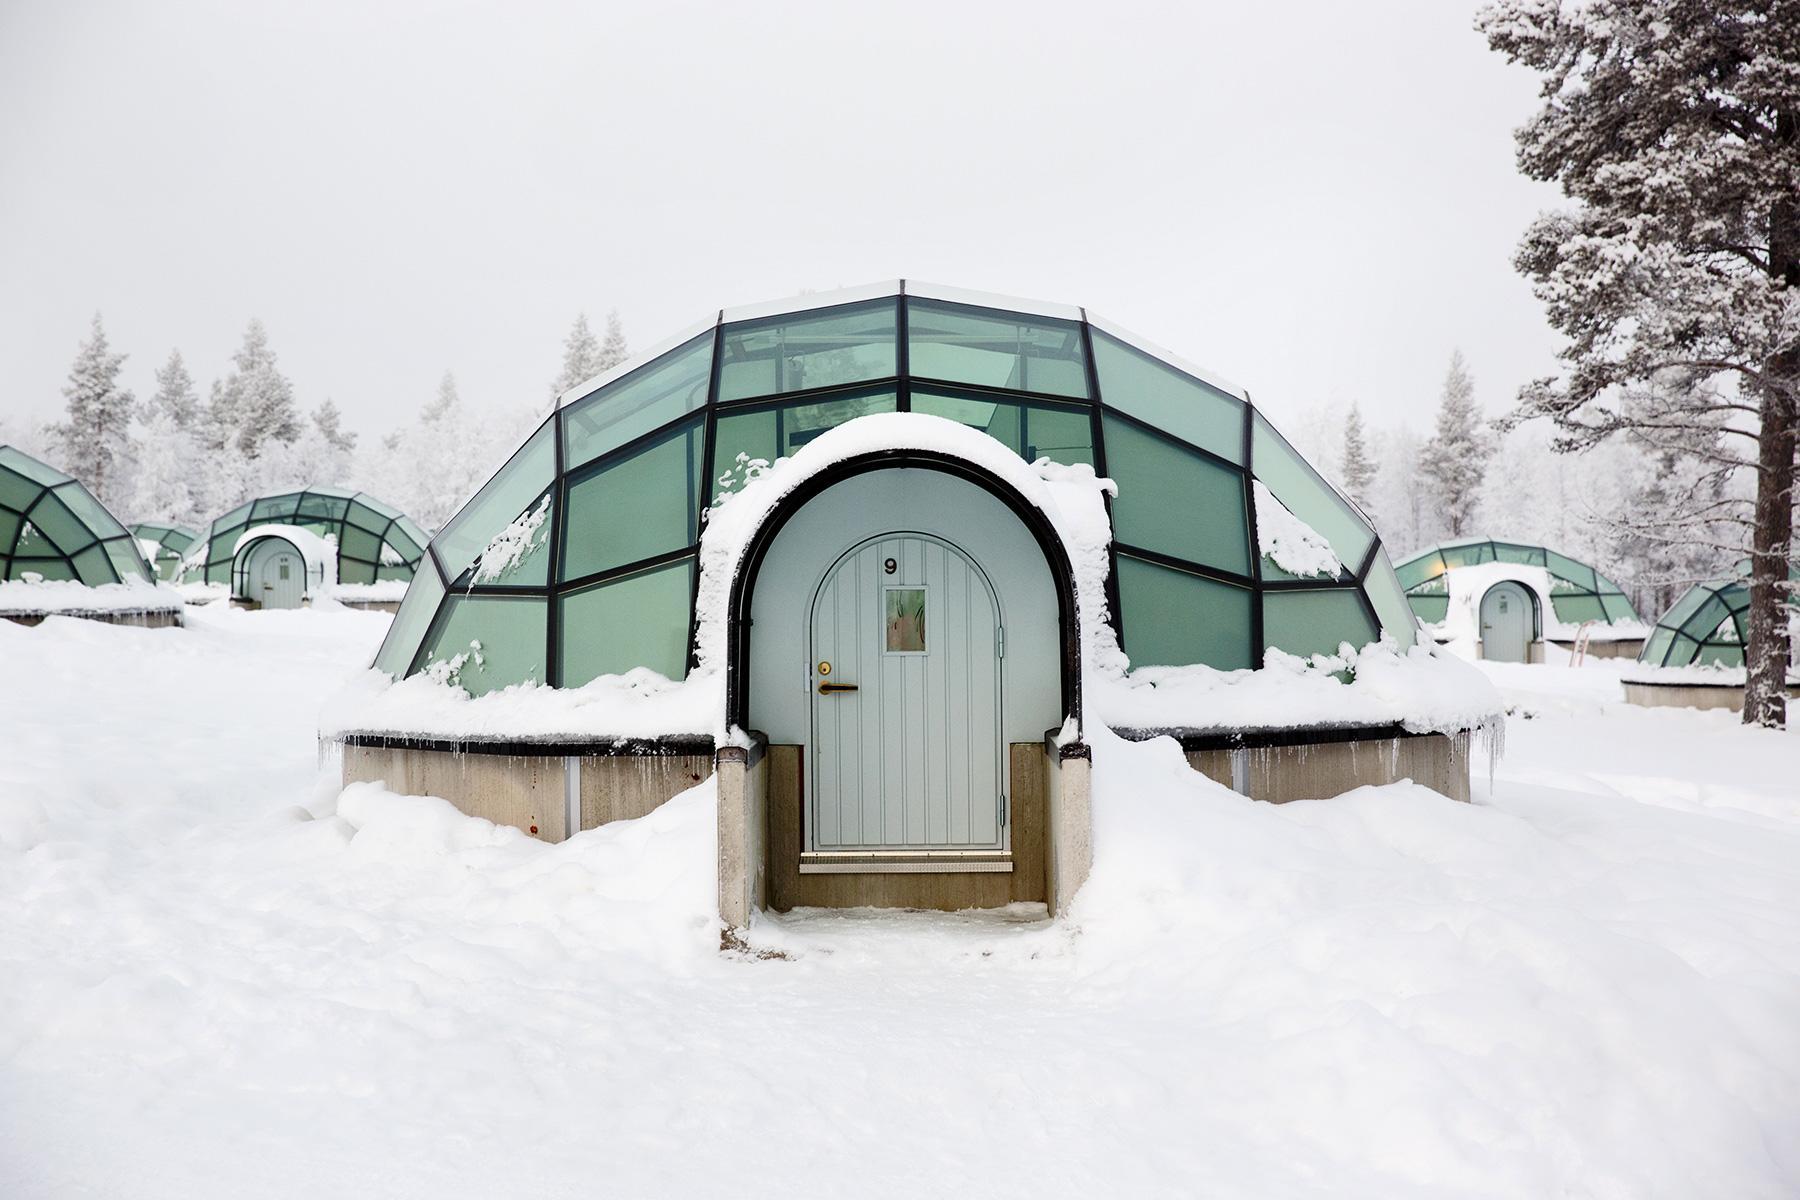 01_IceHotels__HotelKakslauttanenIglooV_shutterstock_597997043